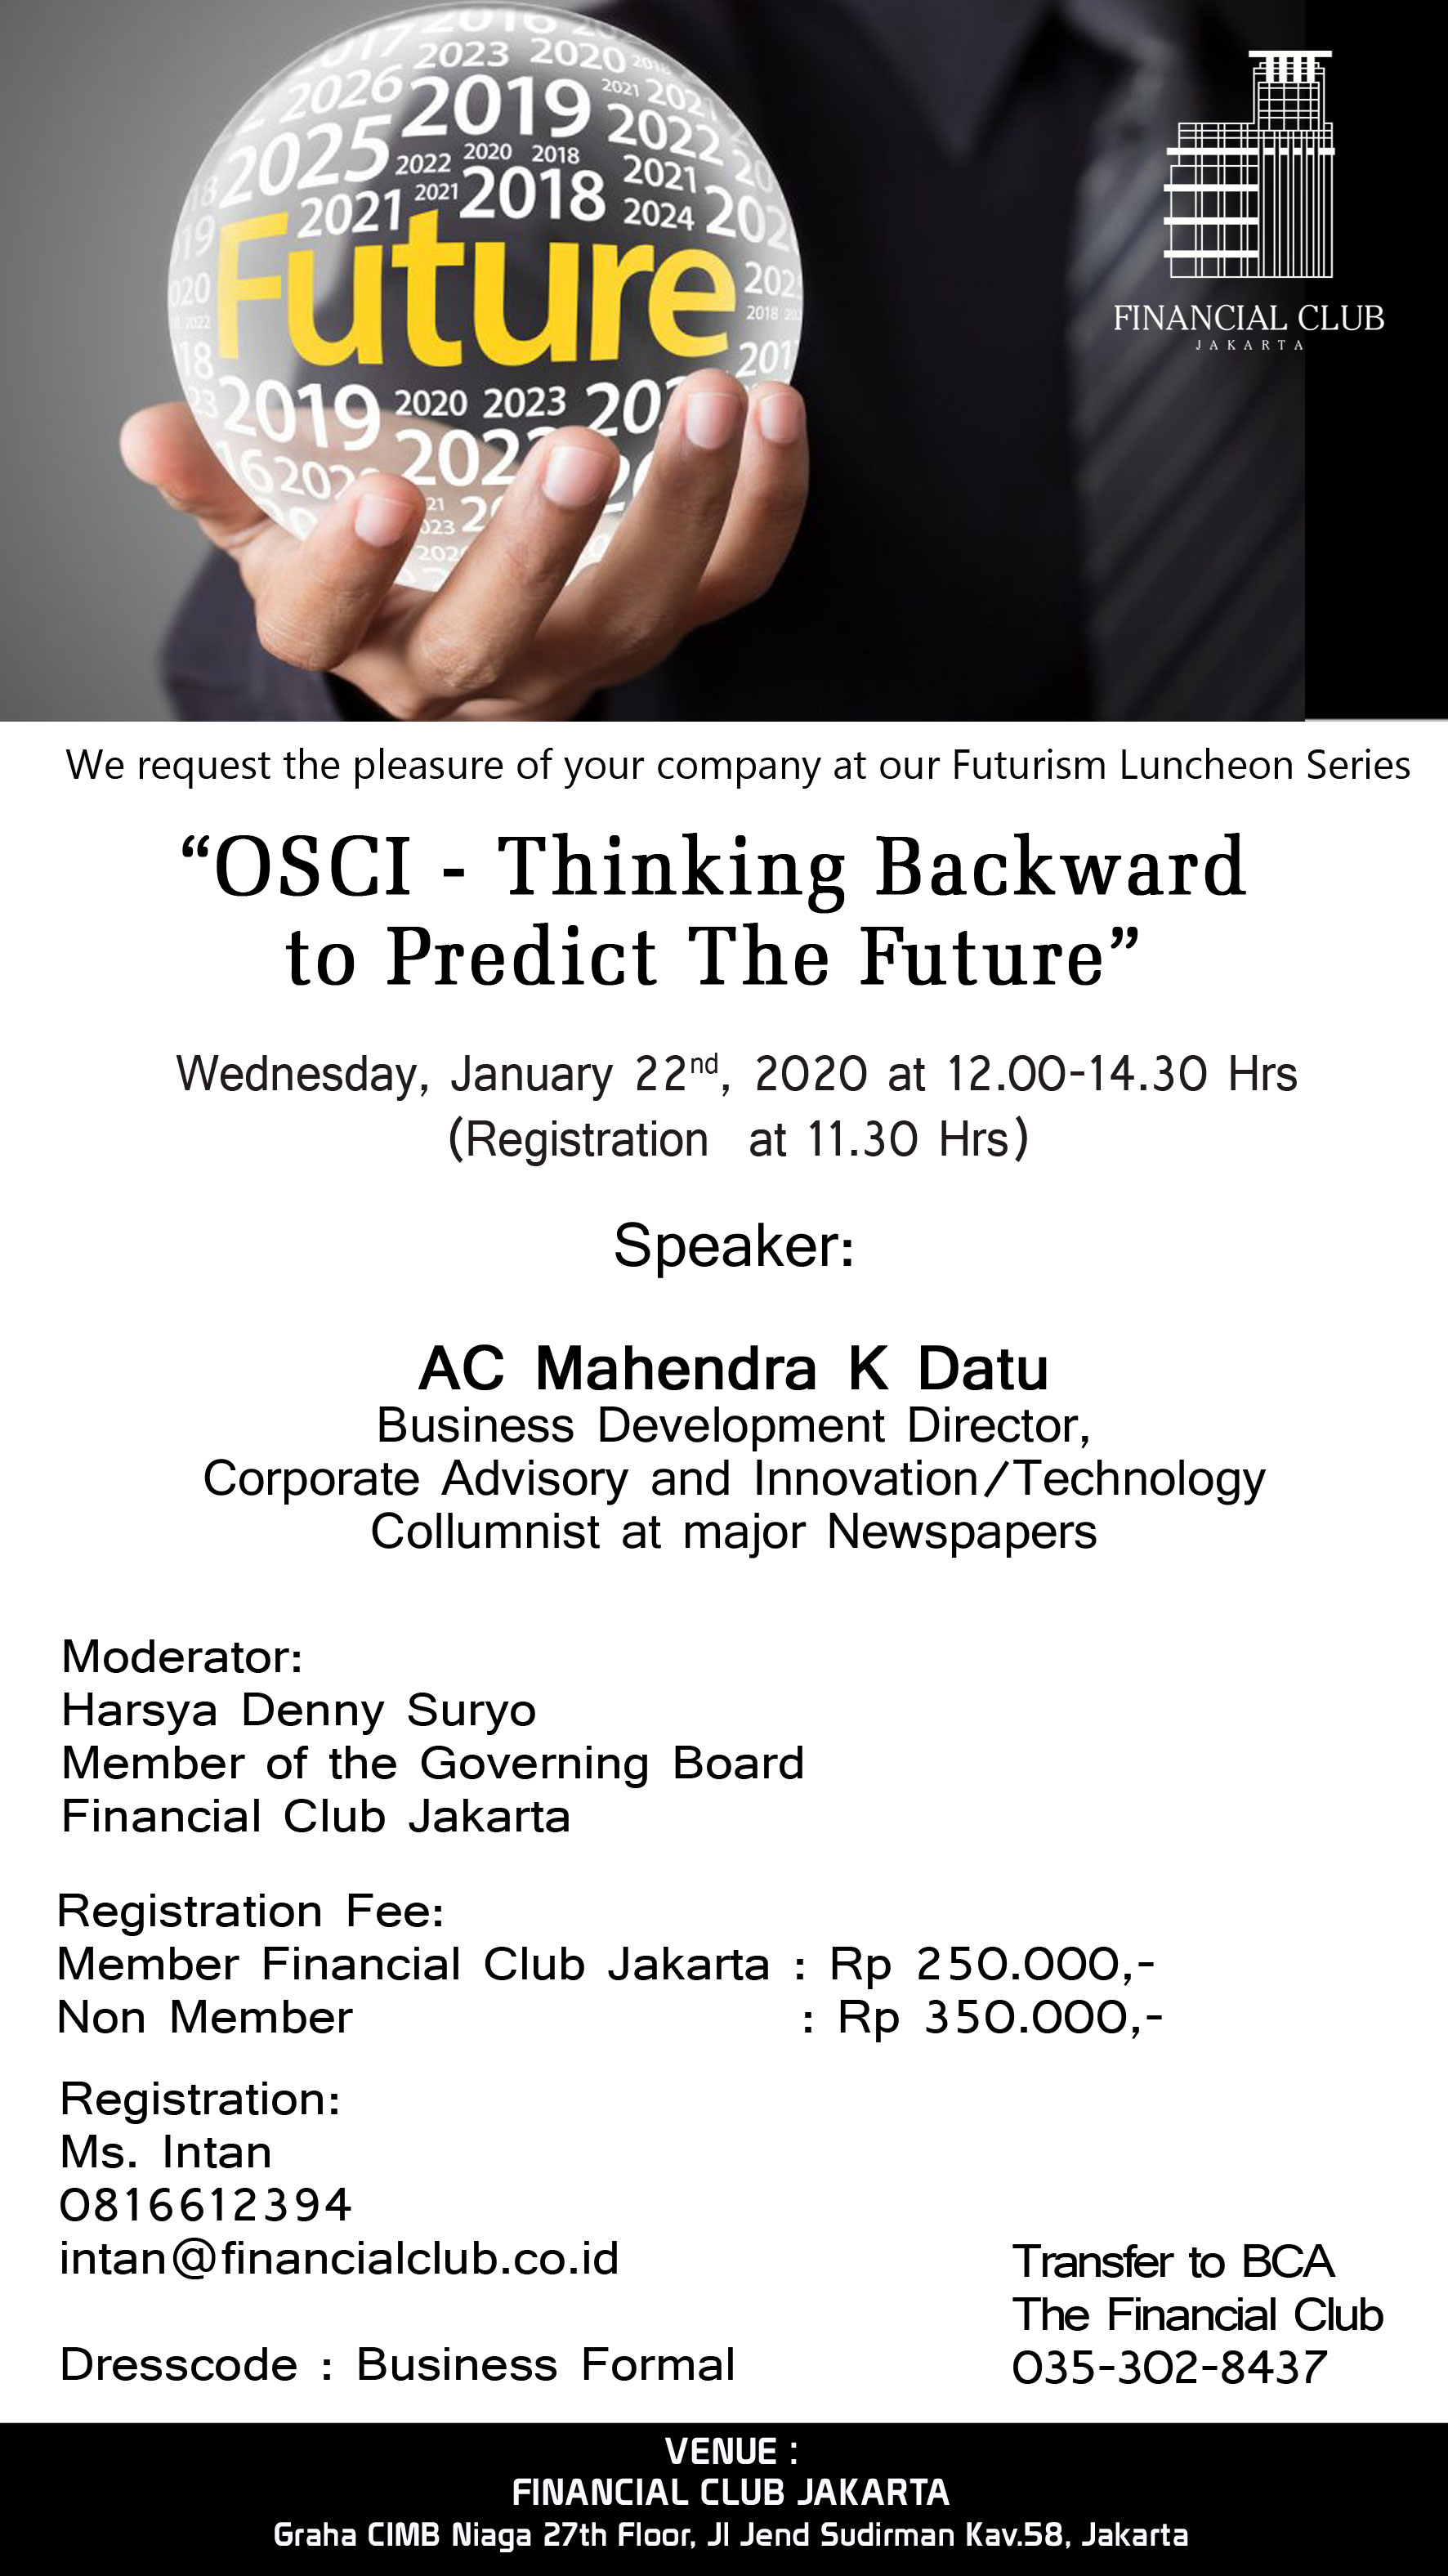 "Futurism Luncheon Series ""OSCI-Thinking Backward to Predict The Future"""